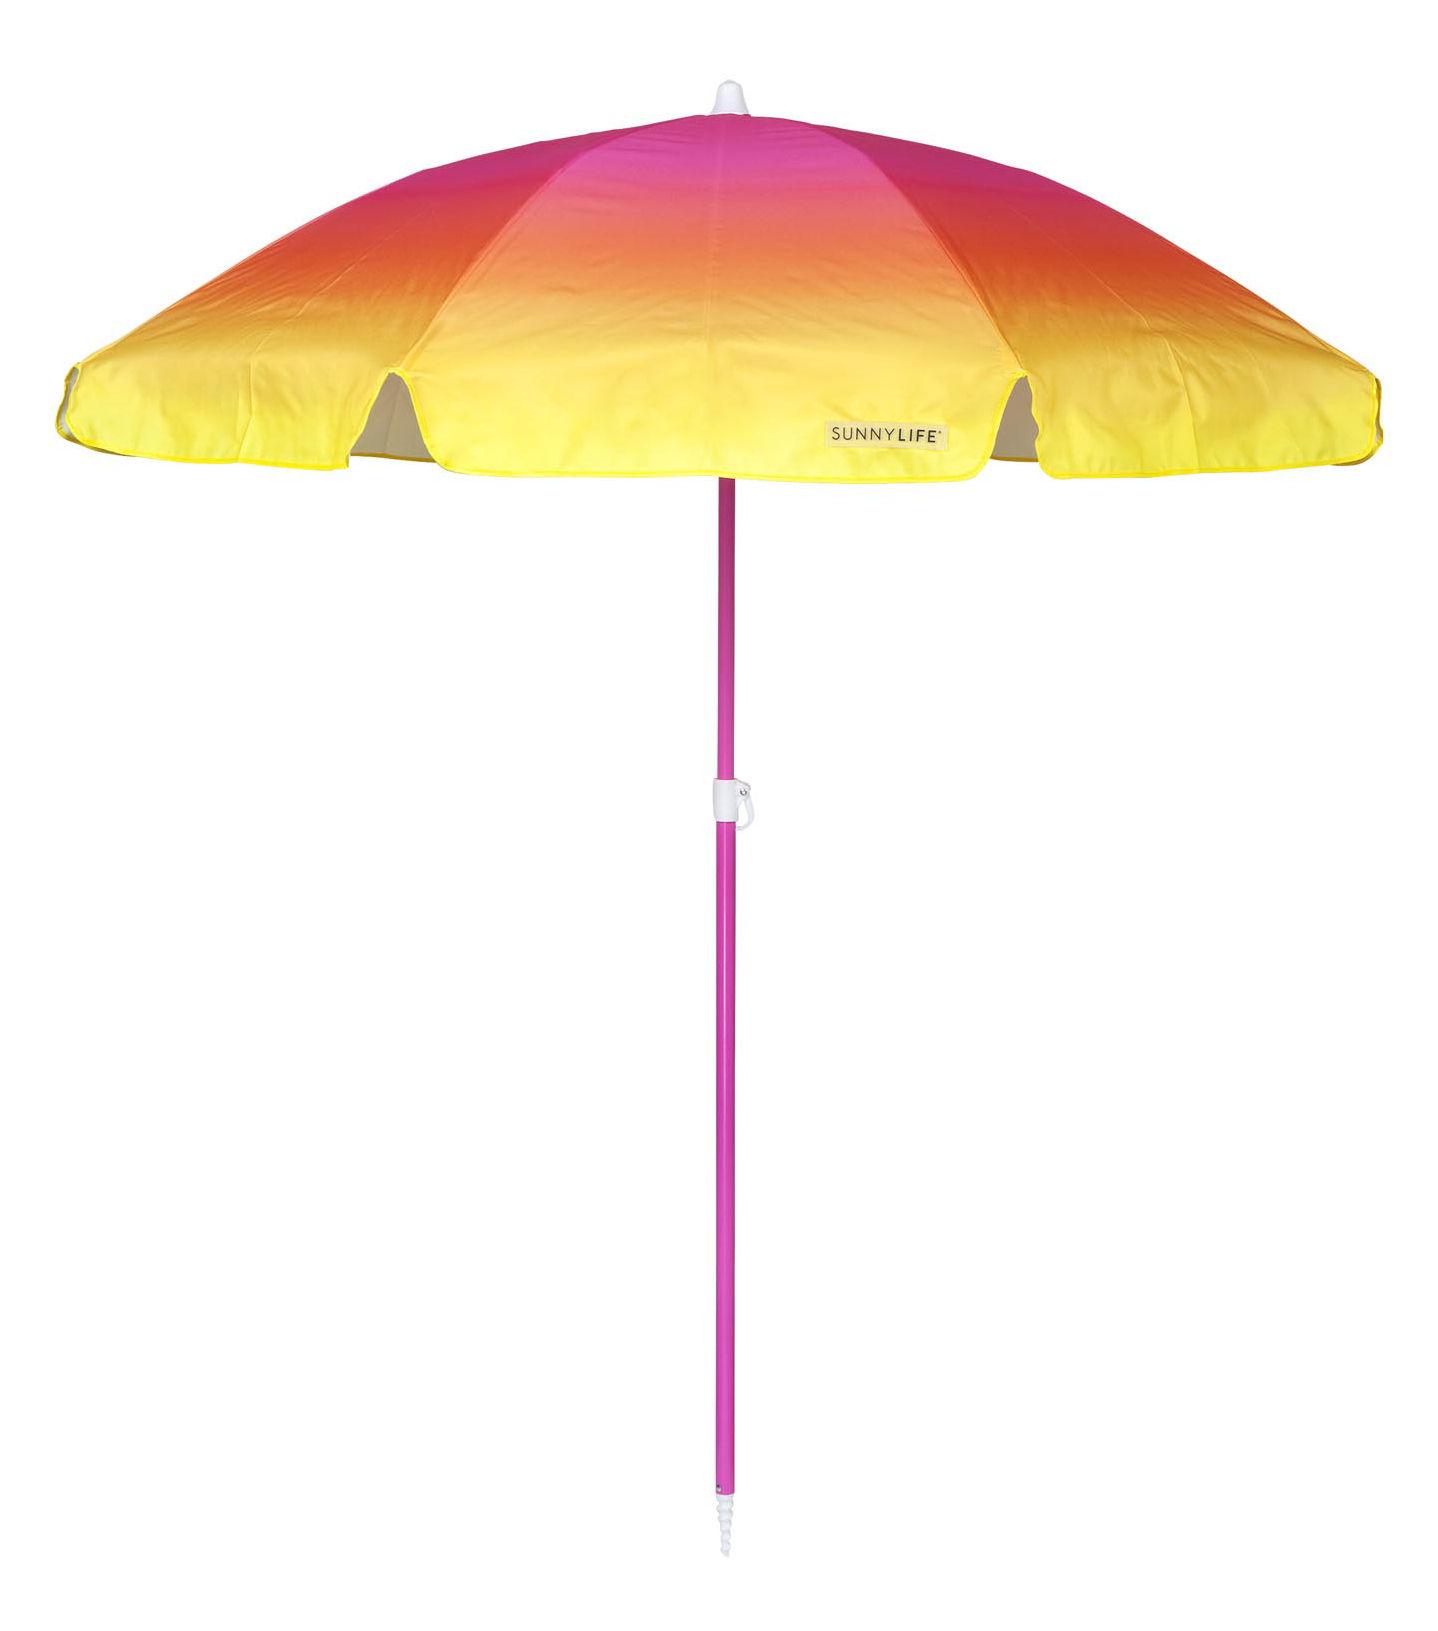 Outdoor - Parasols - Parasol Malibu / Ø 170 cm - Sunnylife - Malibu / Rose & jaune - Acier laqué époxy, Polyester